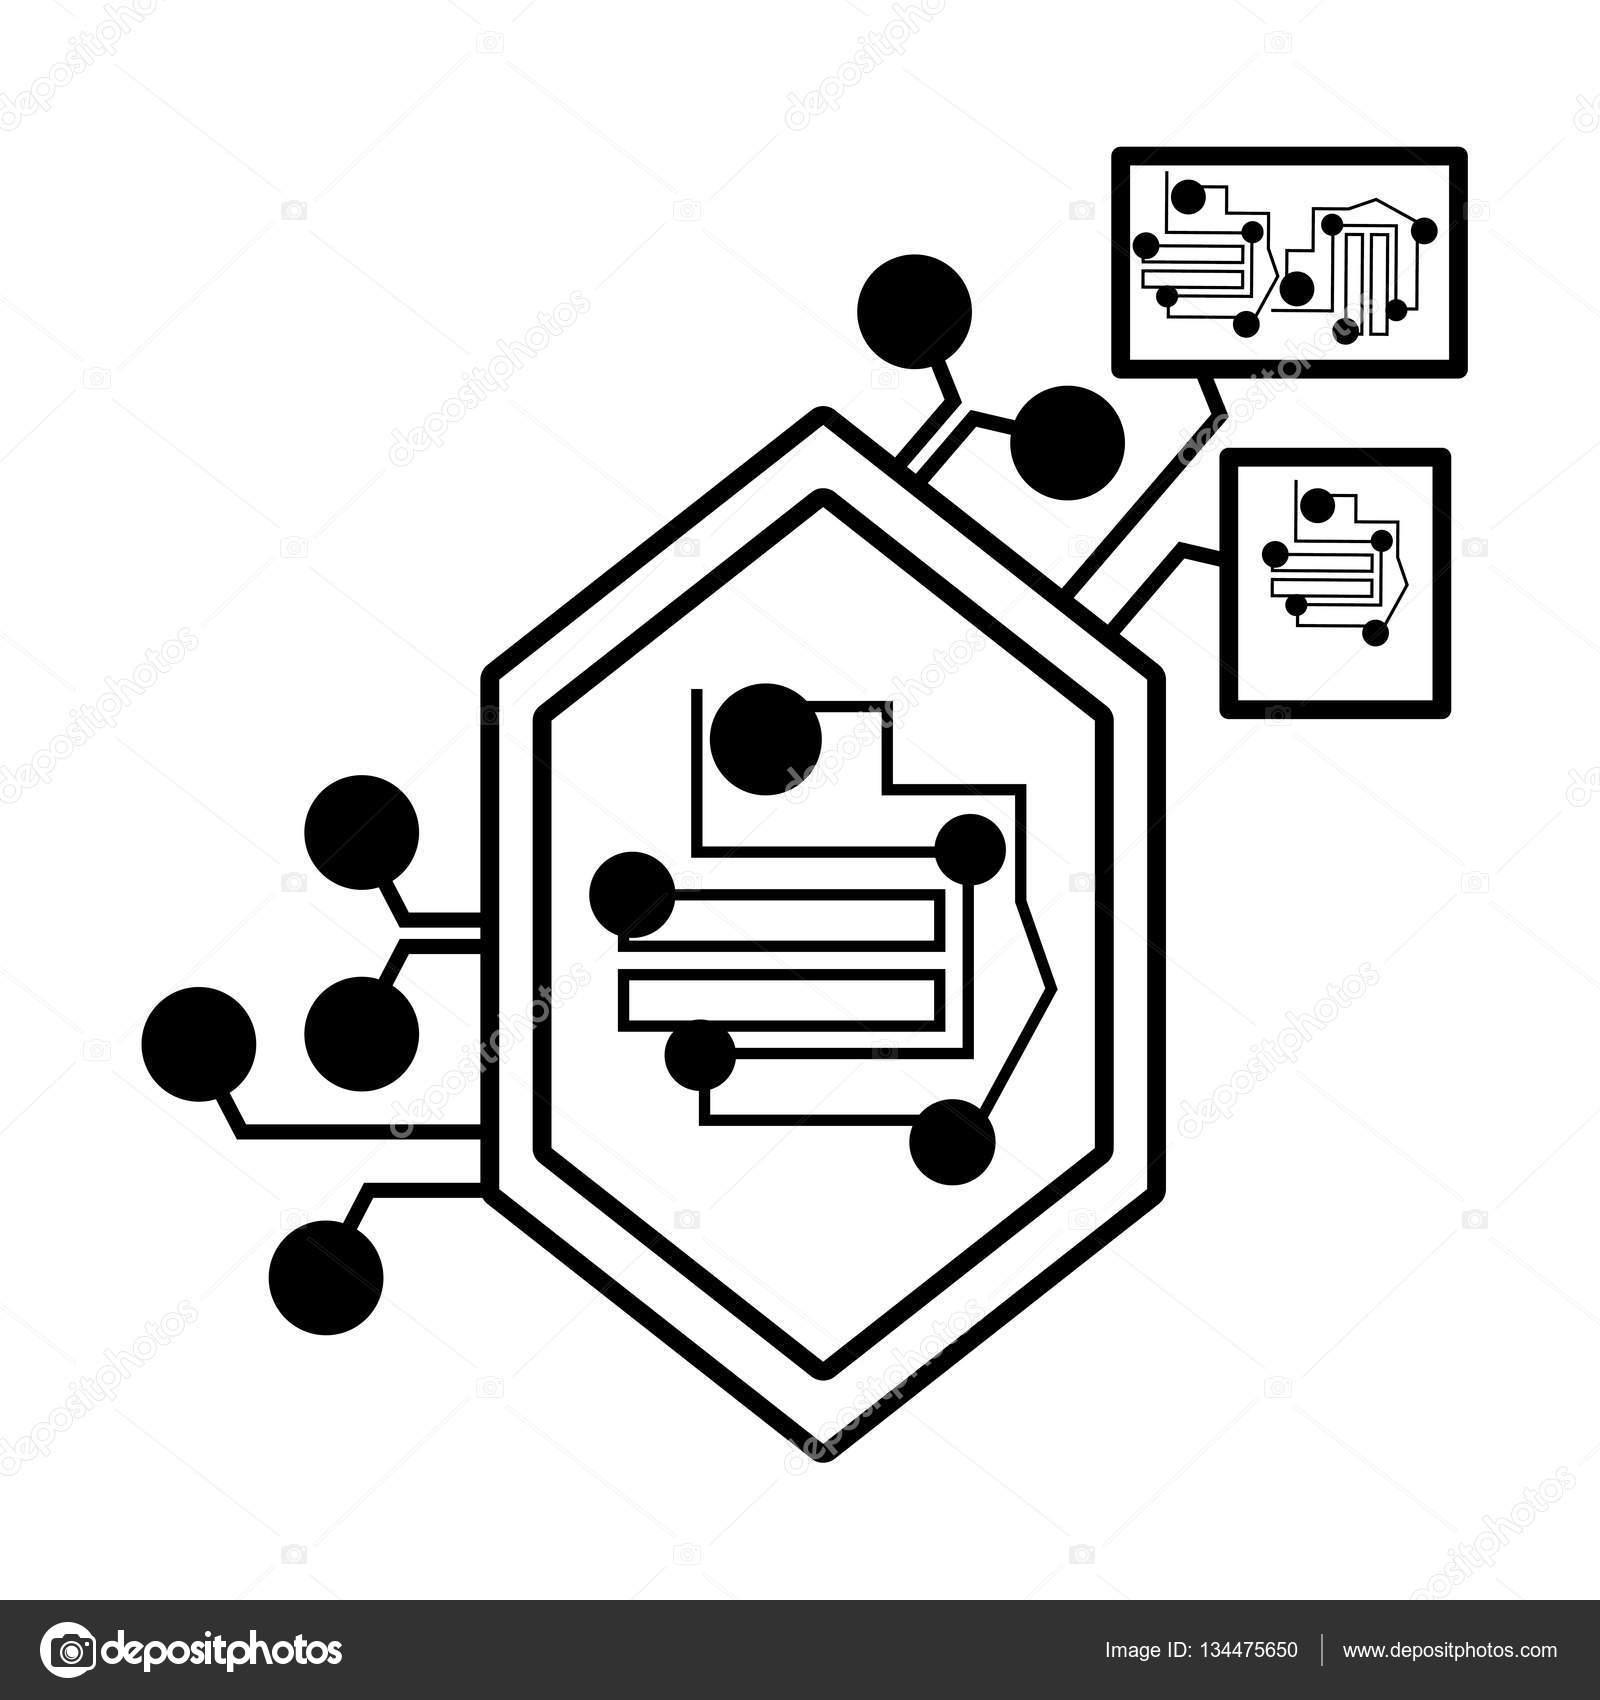 Circuito Lineal : Equipo circuito hexagonal componente electrónico lineal u vector